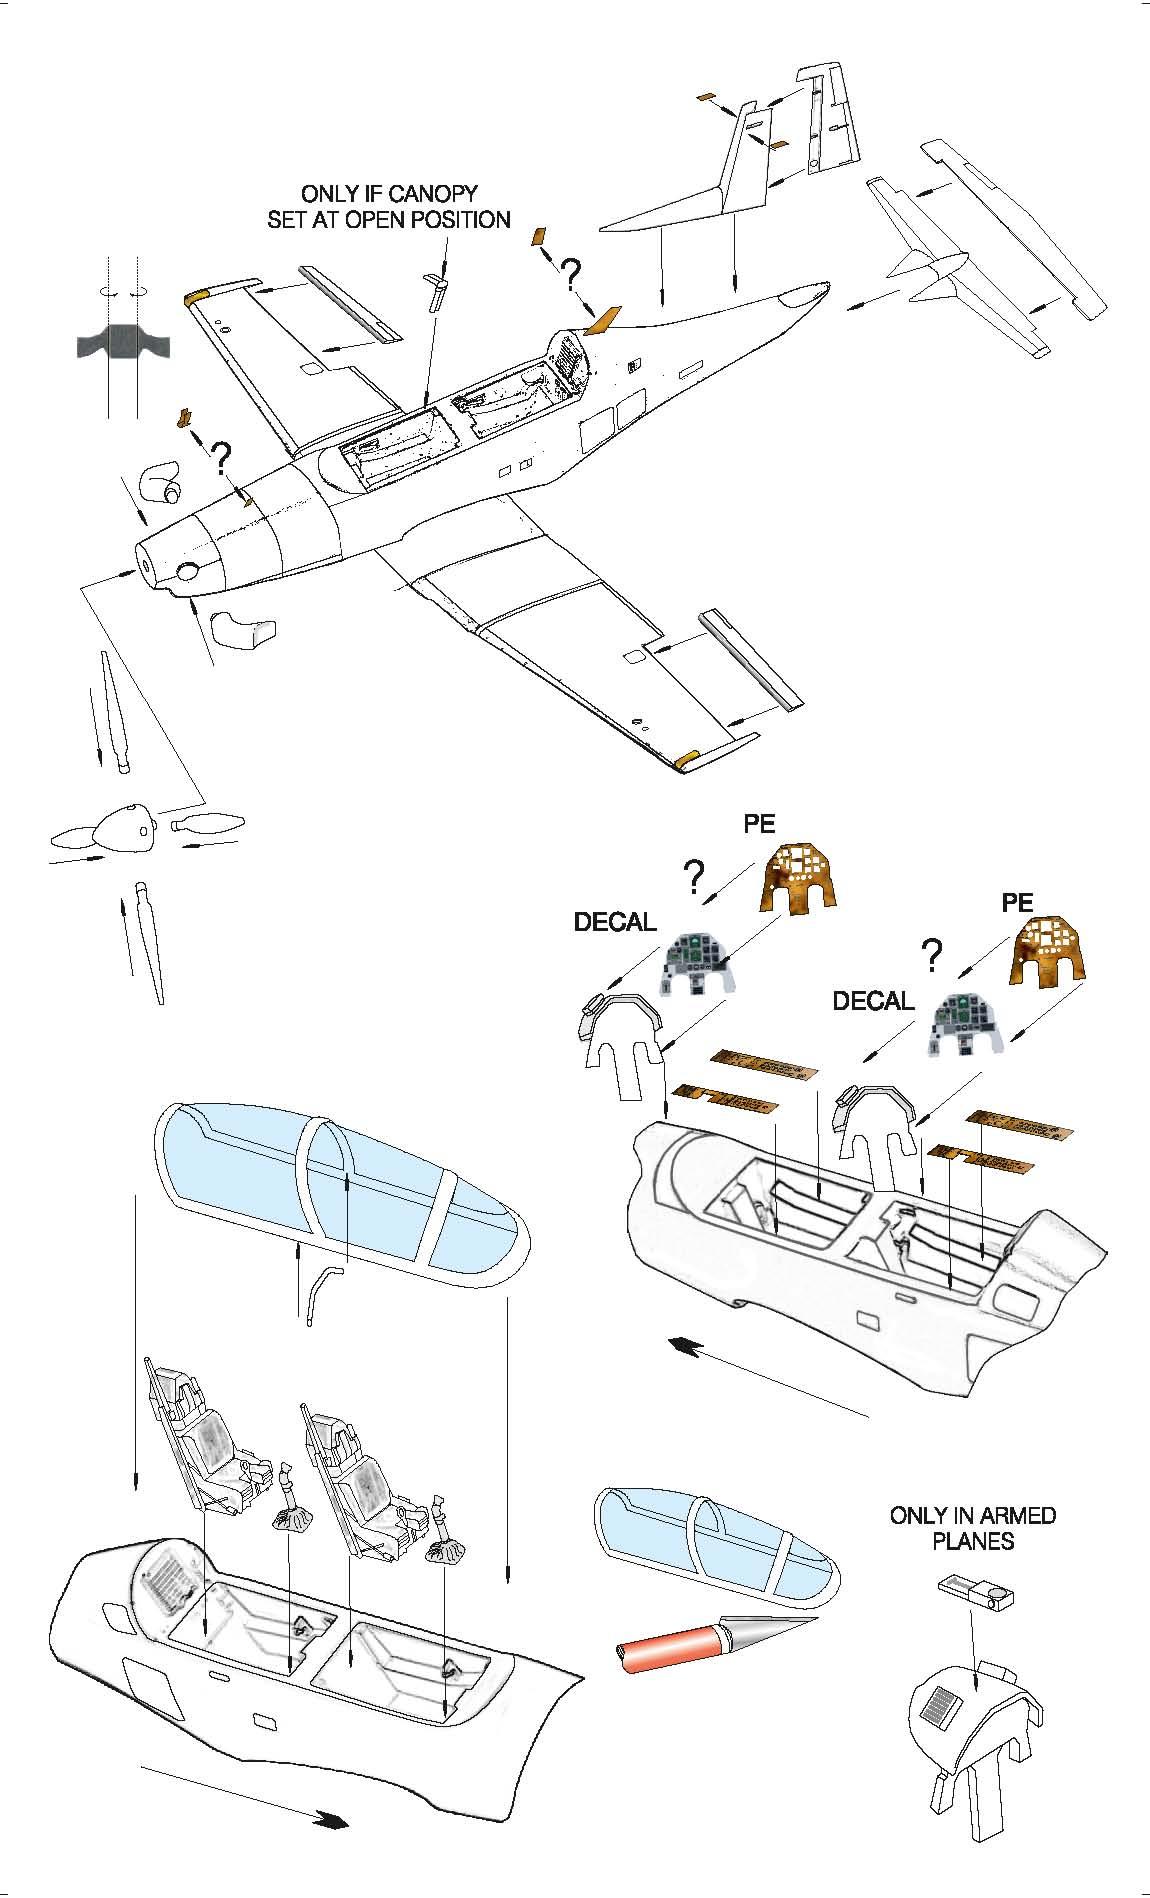 Grand Models Beechcraft T 6a Nta Texan Ii 1 72 Scale